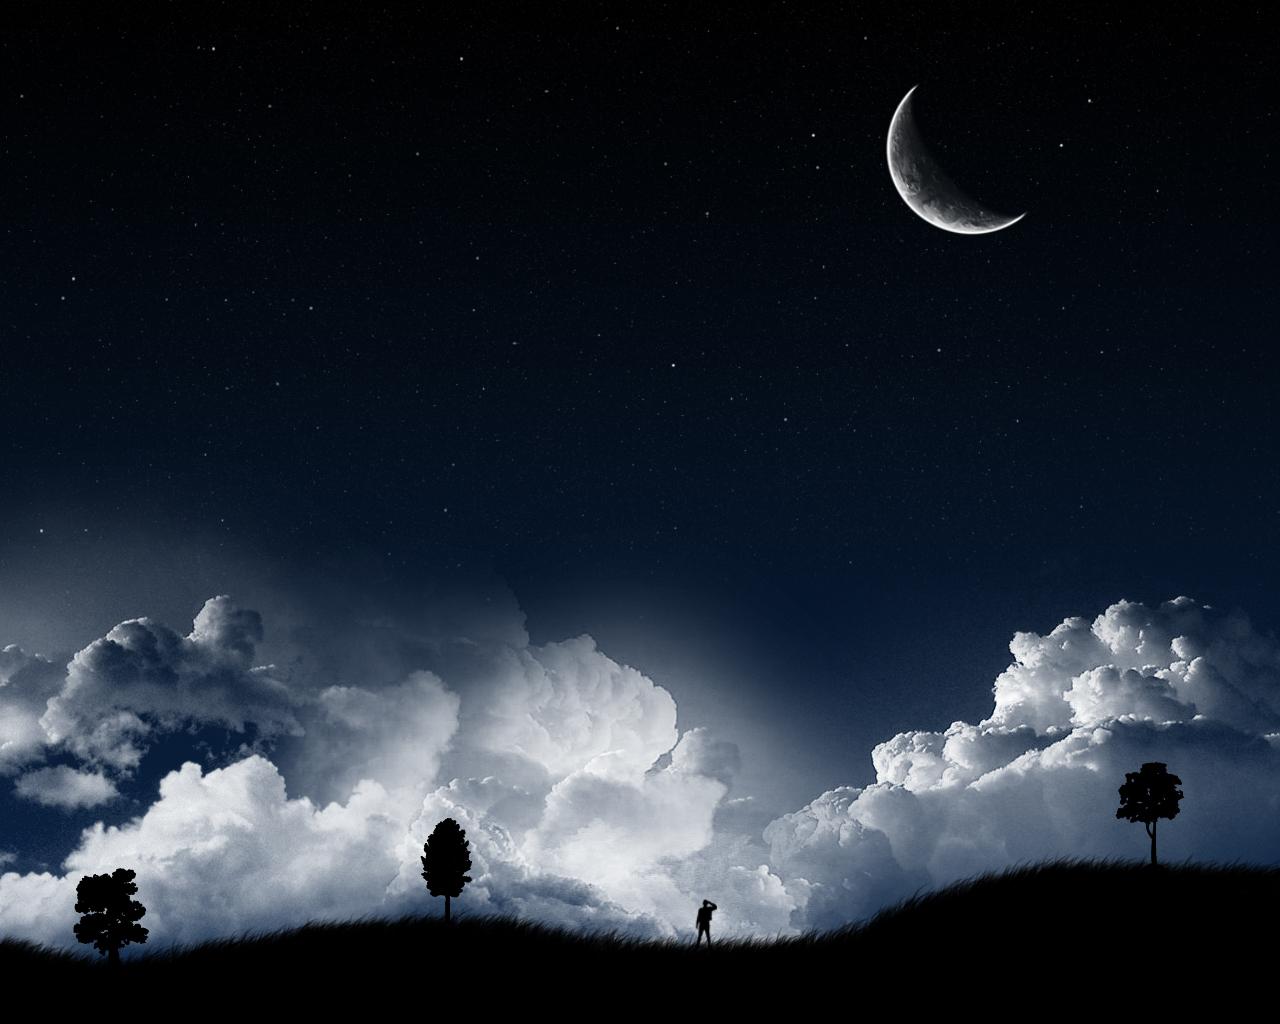 cool dark wallpapers,sky,nature,moon,cloud,moonlight